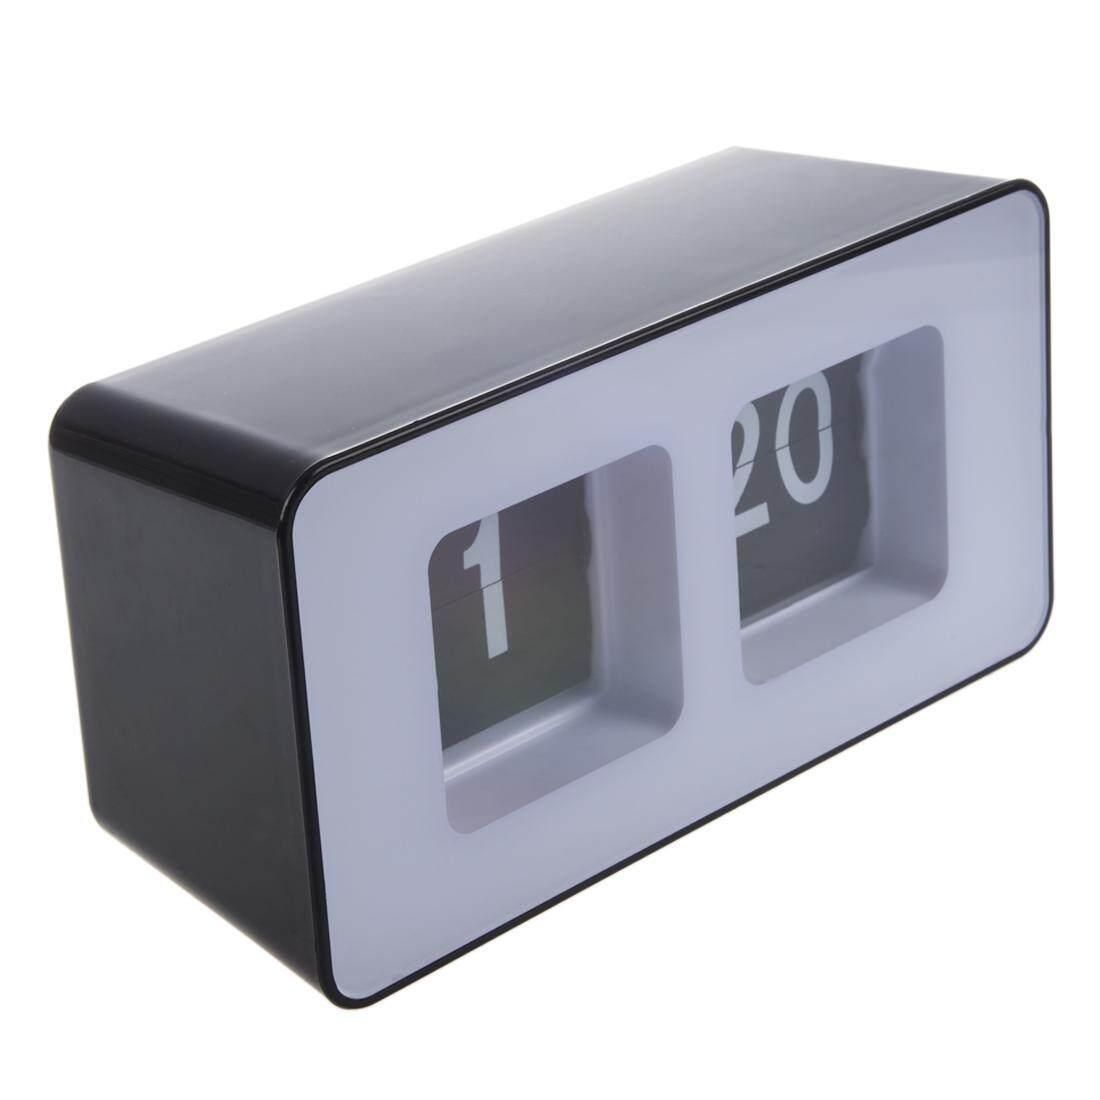 How To Buy Retro Auto Flip Clock Classic Stylish Modern Desk Wall Clock Intl